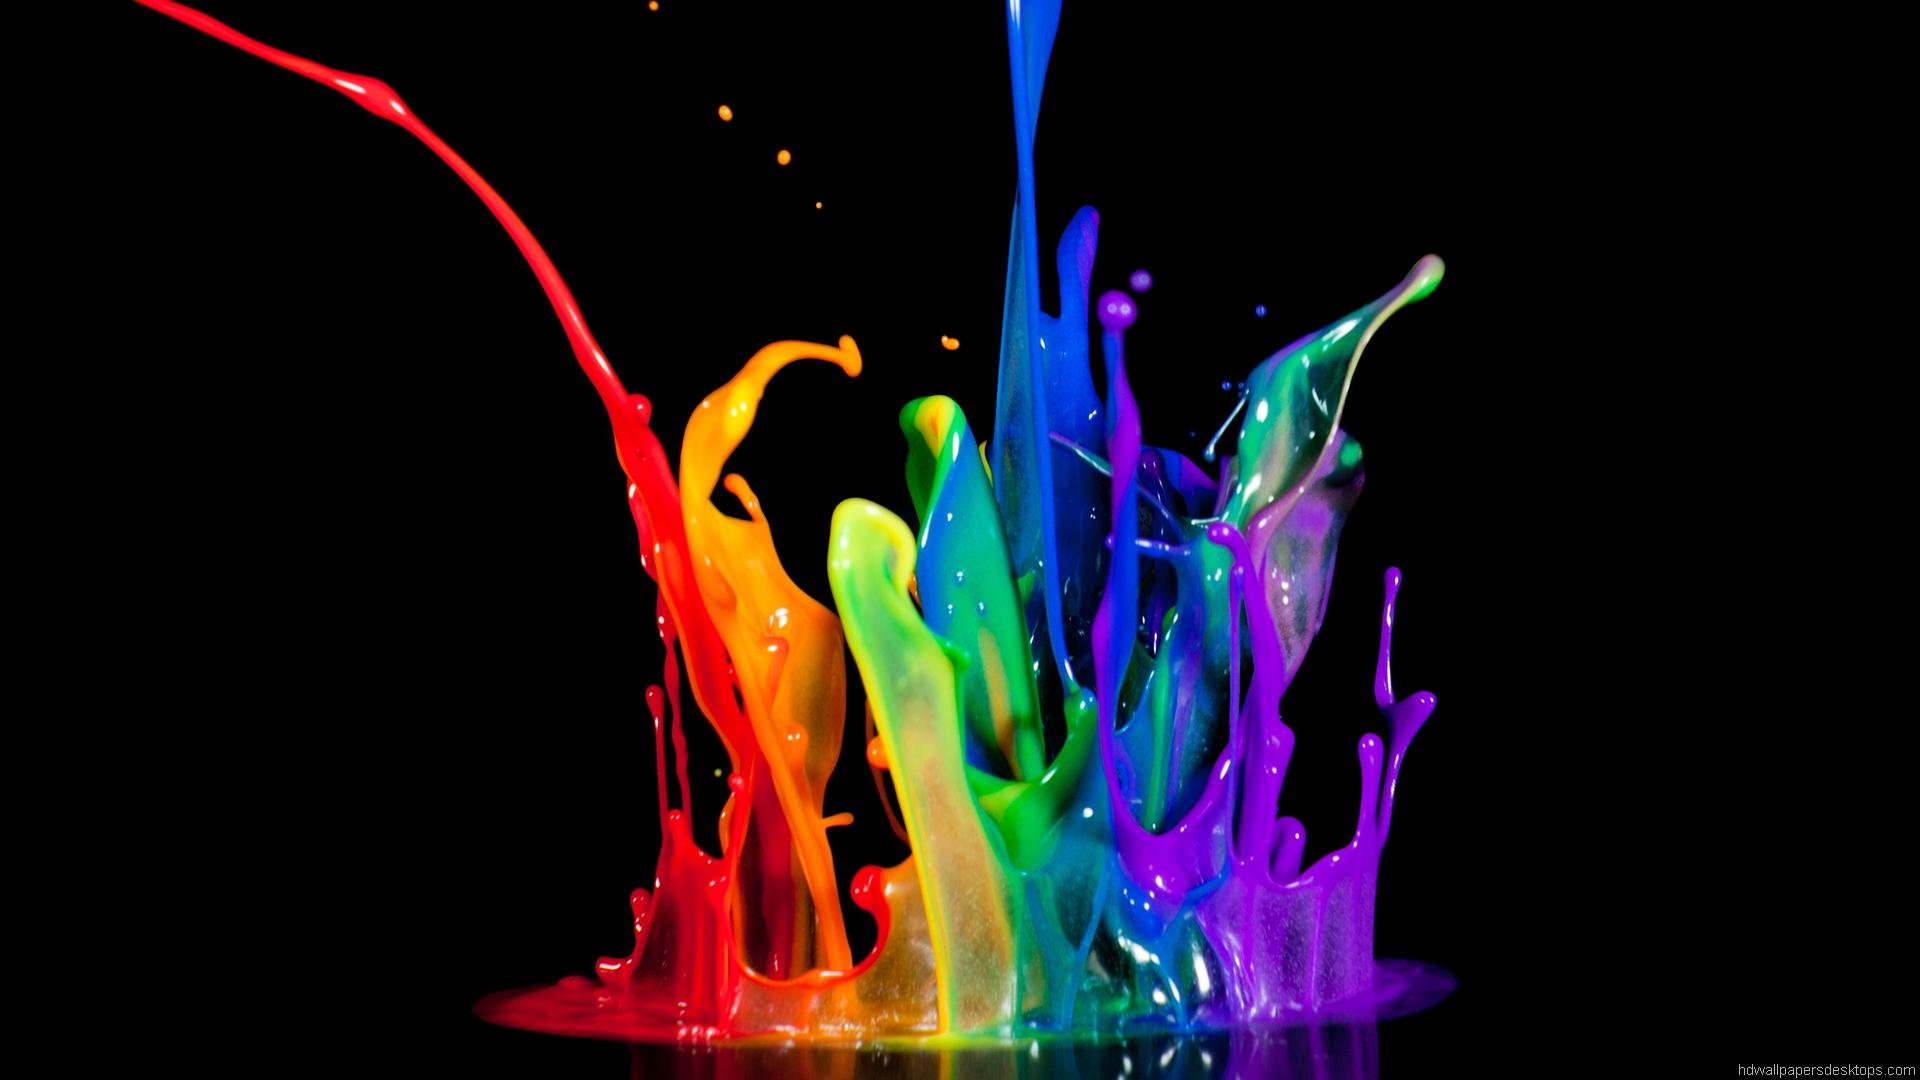 Hd Wallpaper Color Download: HD Color Wallpapers